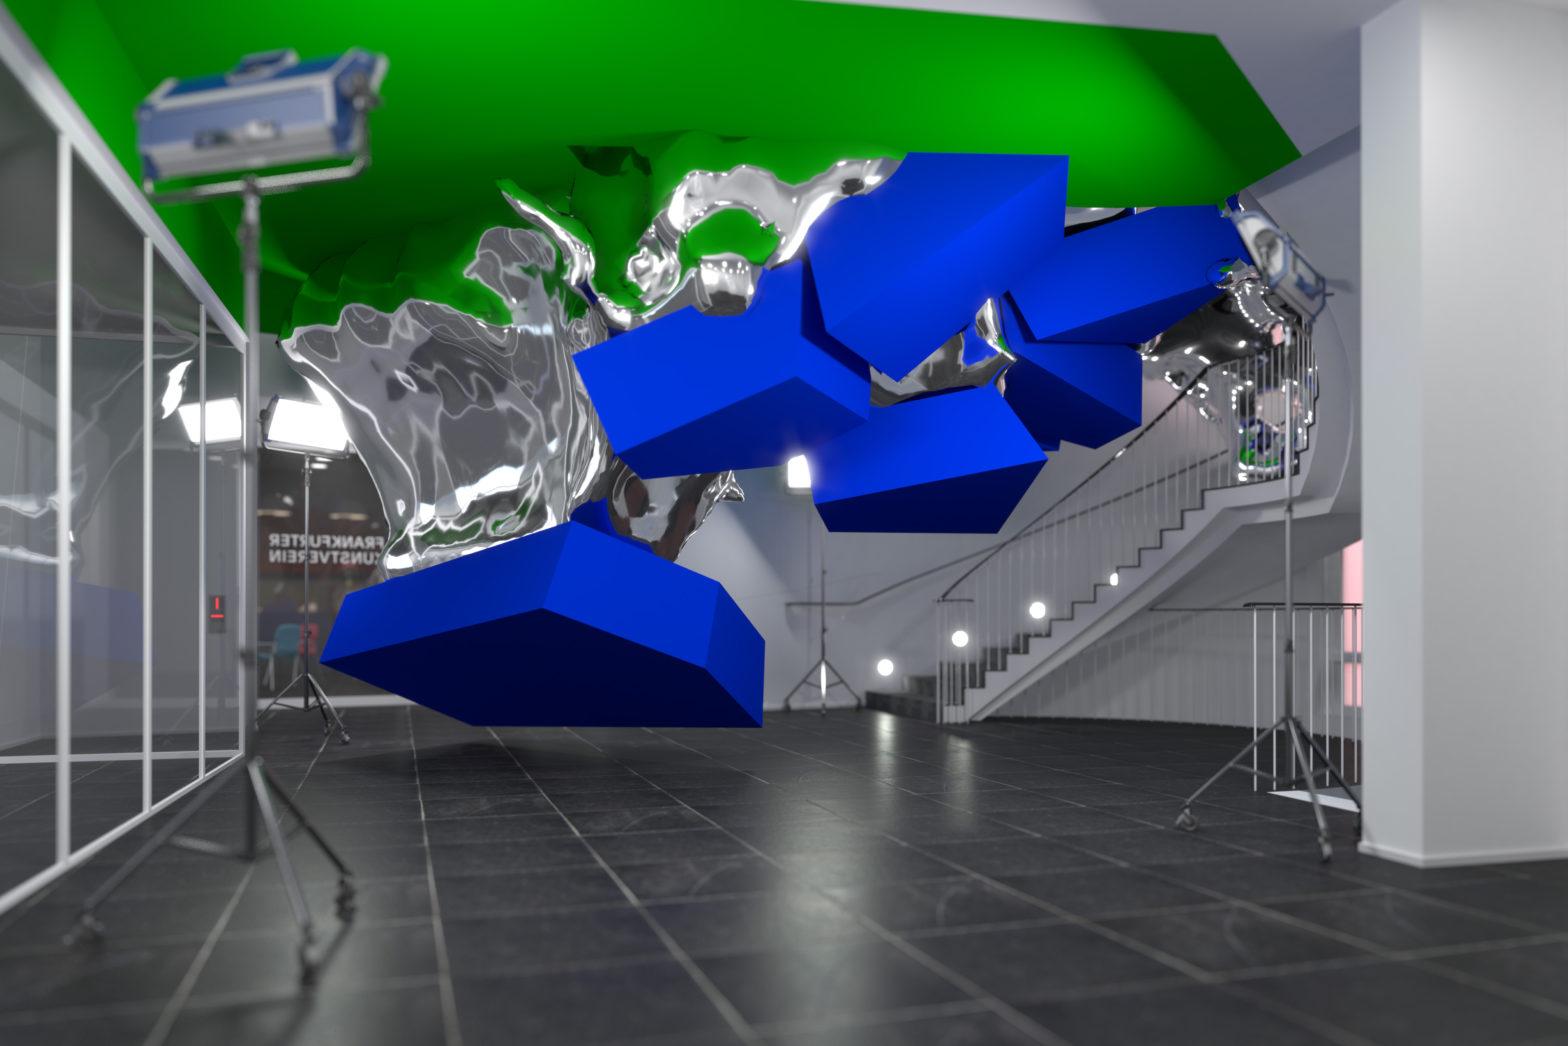 Wetware, Frankfurter Kunstverein, Main Image